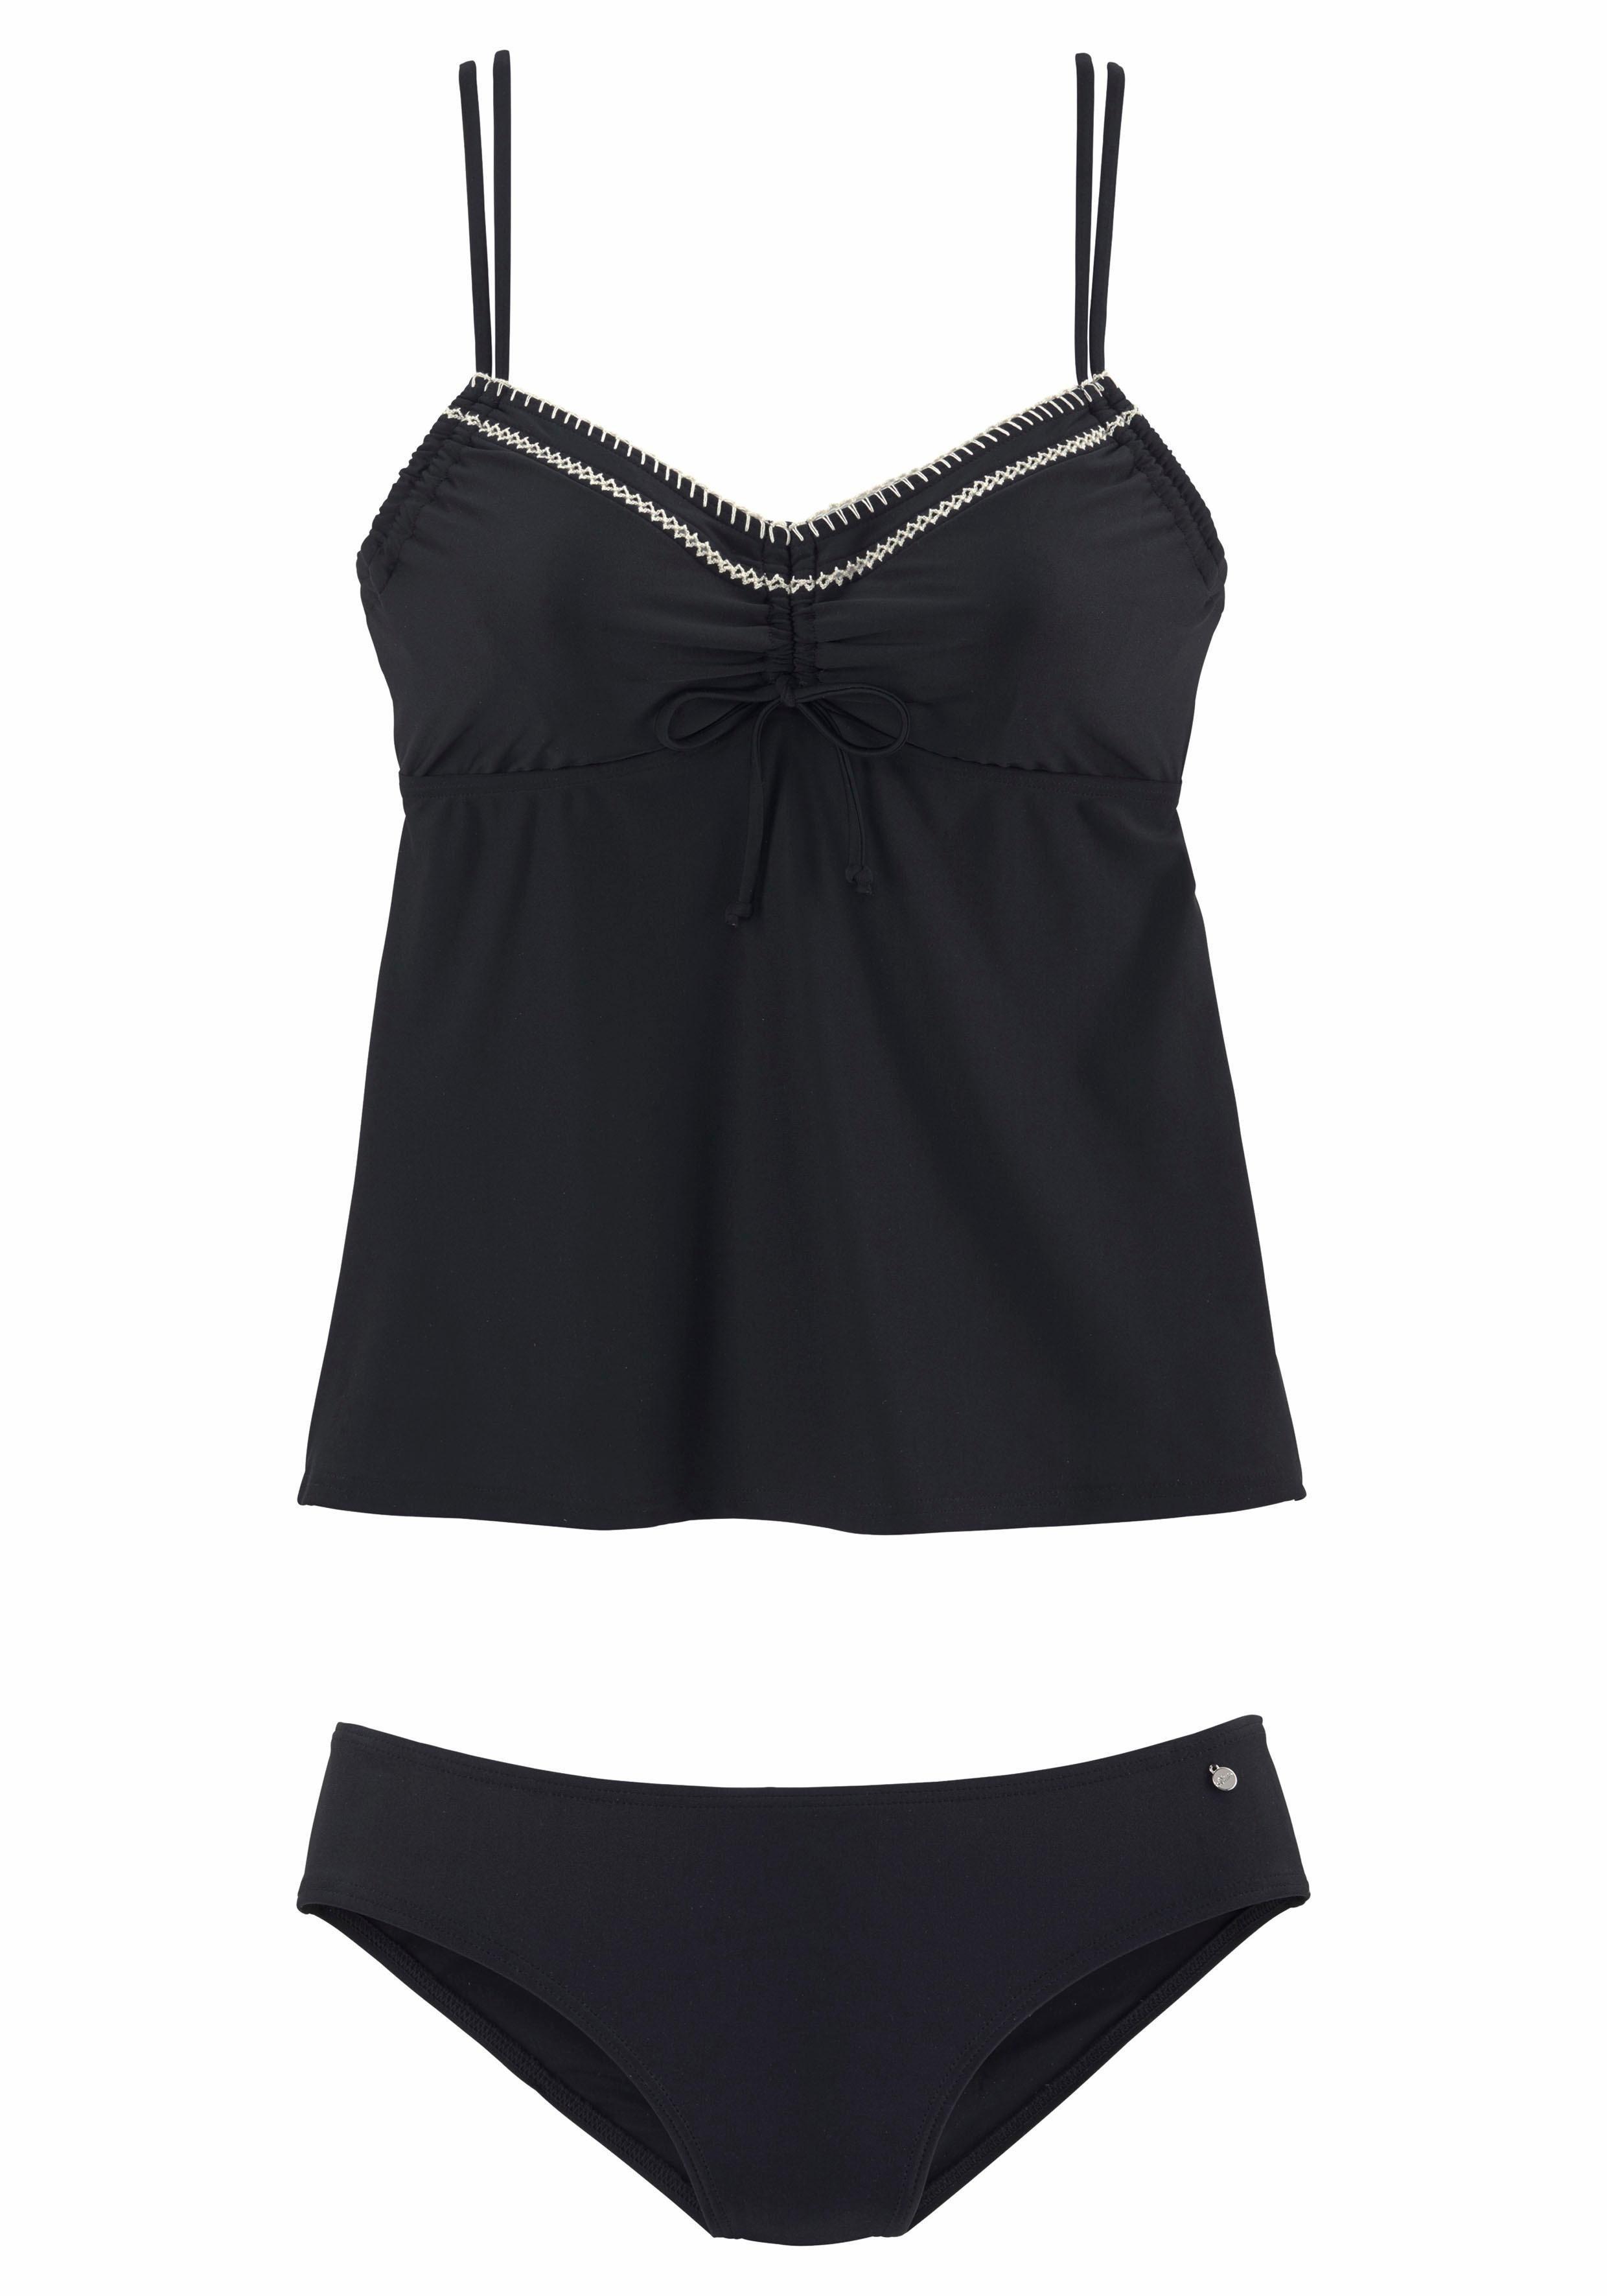 s.Oliver RED LABEL Beachwear Bügel-Tankini mit Häkelkante | Bekleidung > Bademode > Tankinis | Elasthan | s.Oliver RED LABEL Beachwear